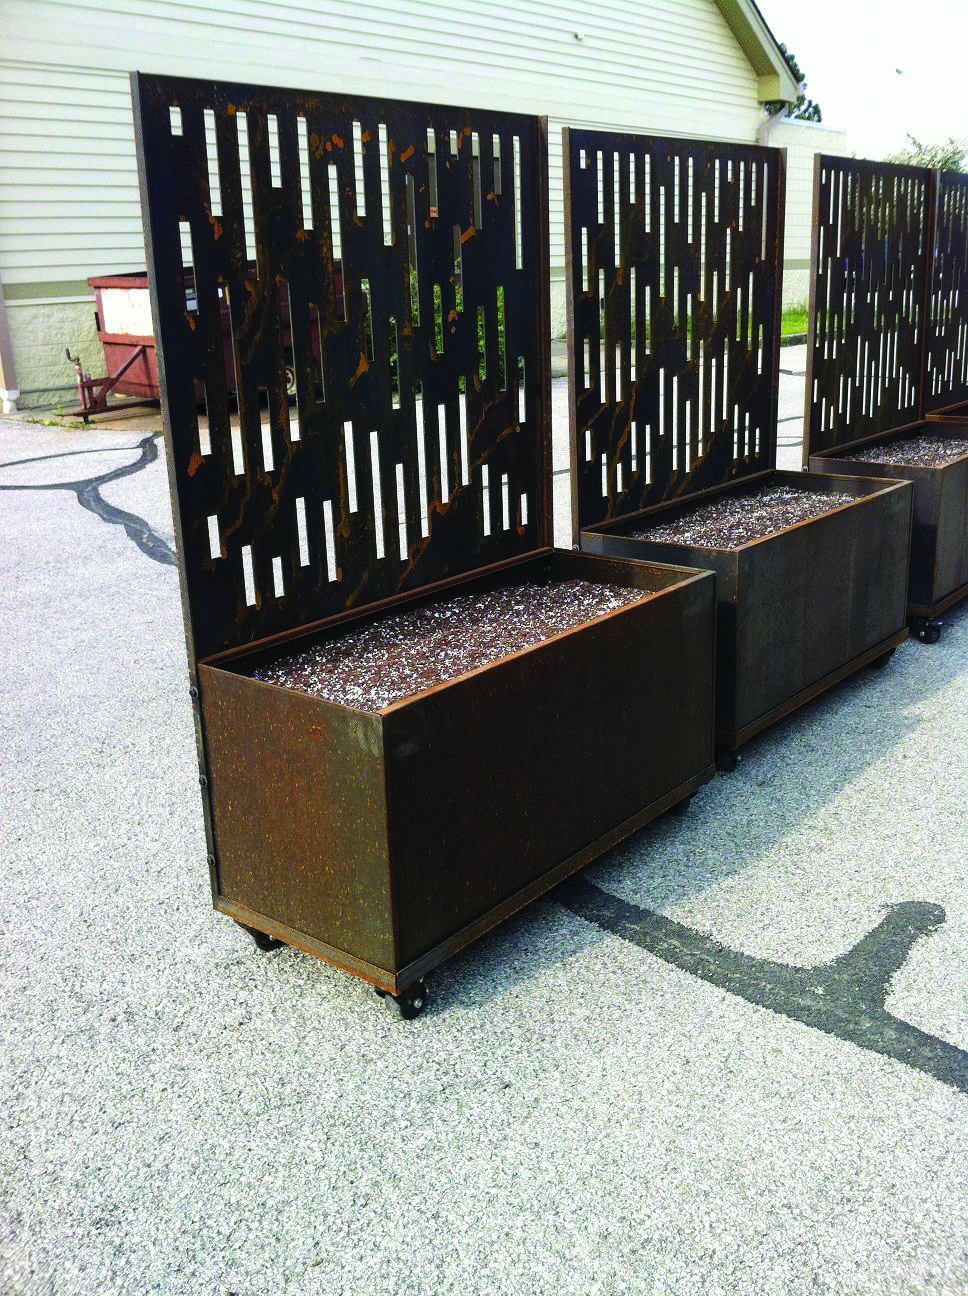 Exceptional Diy Farmer Box Program Designs As Well As 400 x 300